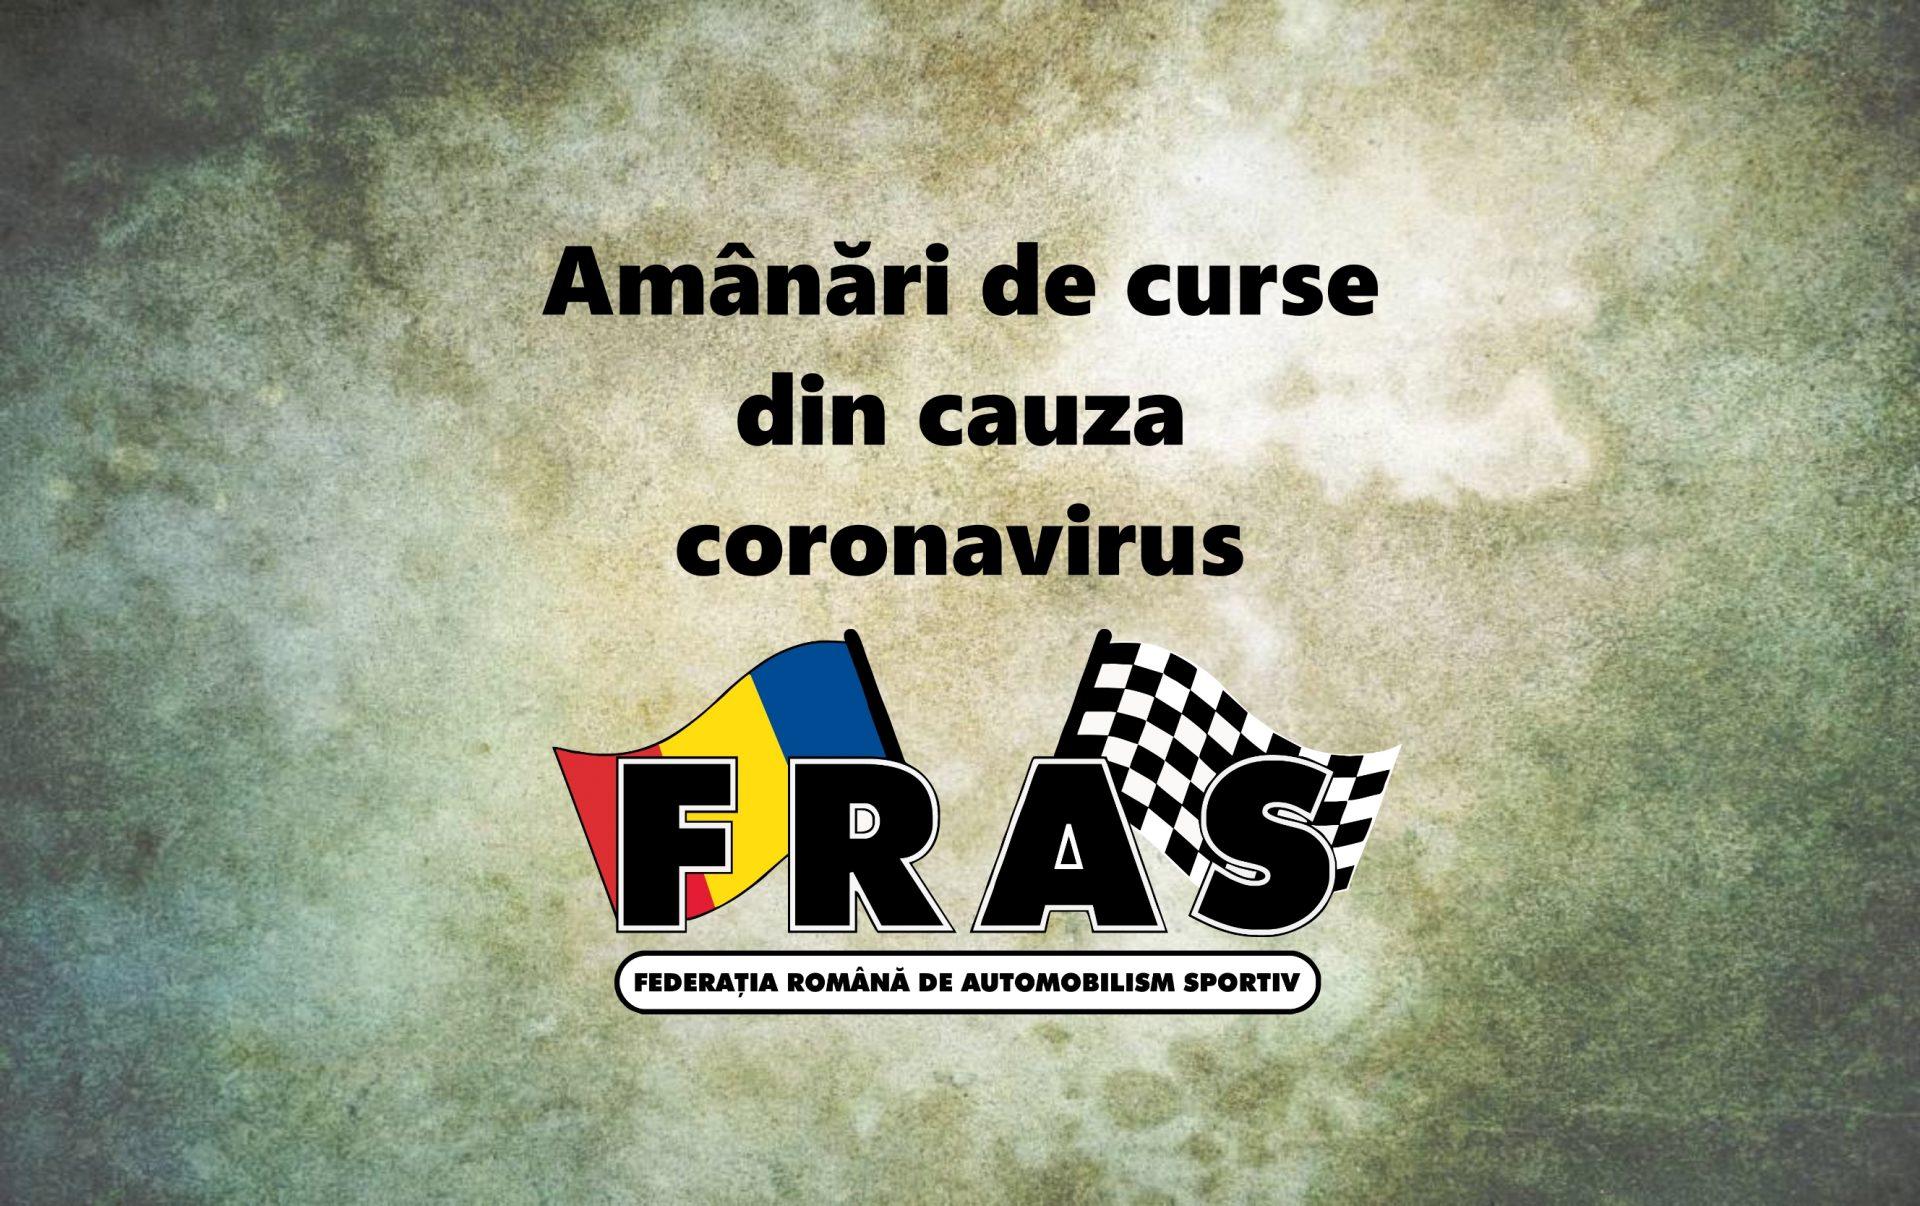 Amanari de competitii in Romania din cauza corona virus